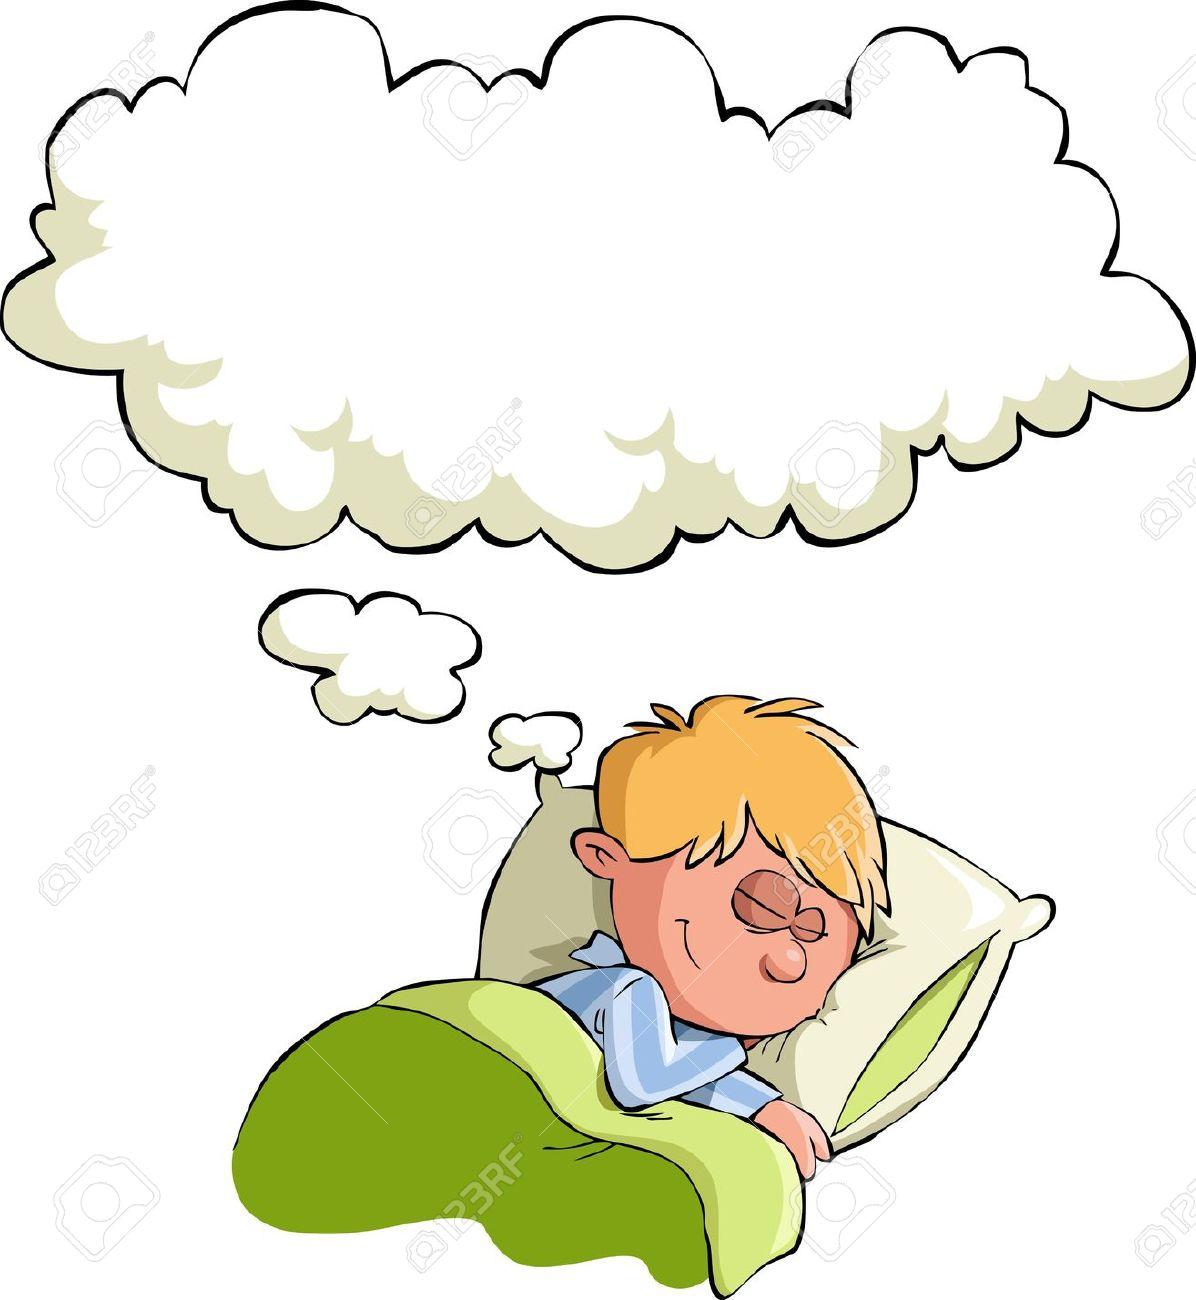 12356572-the-boy-has-a-dream-vector-illustration-stock-vector-sleeping-cartoon-boy